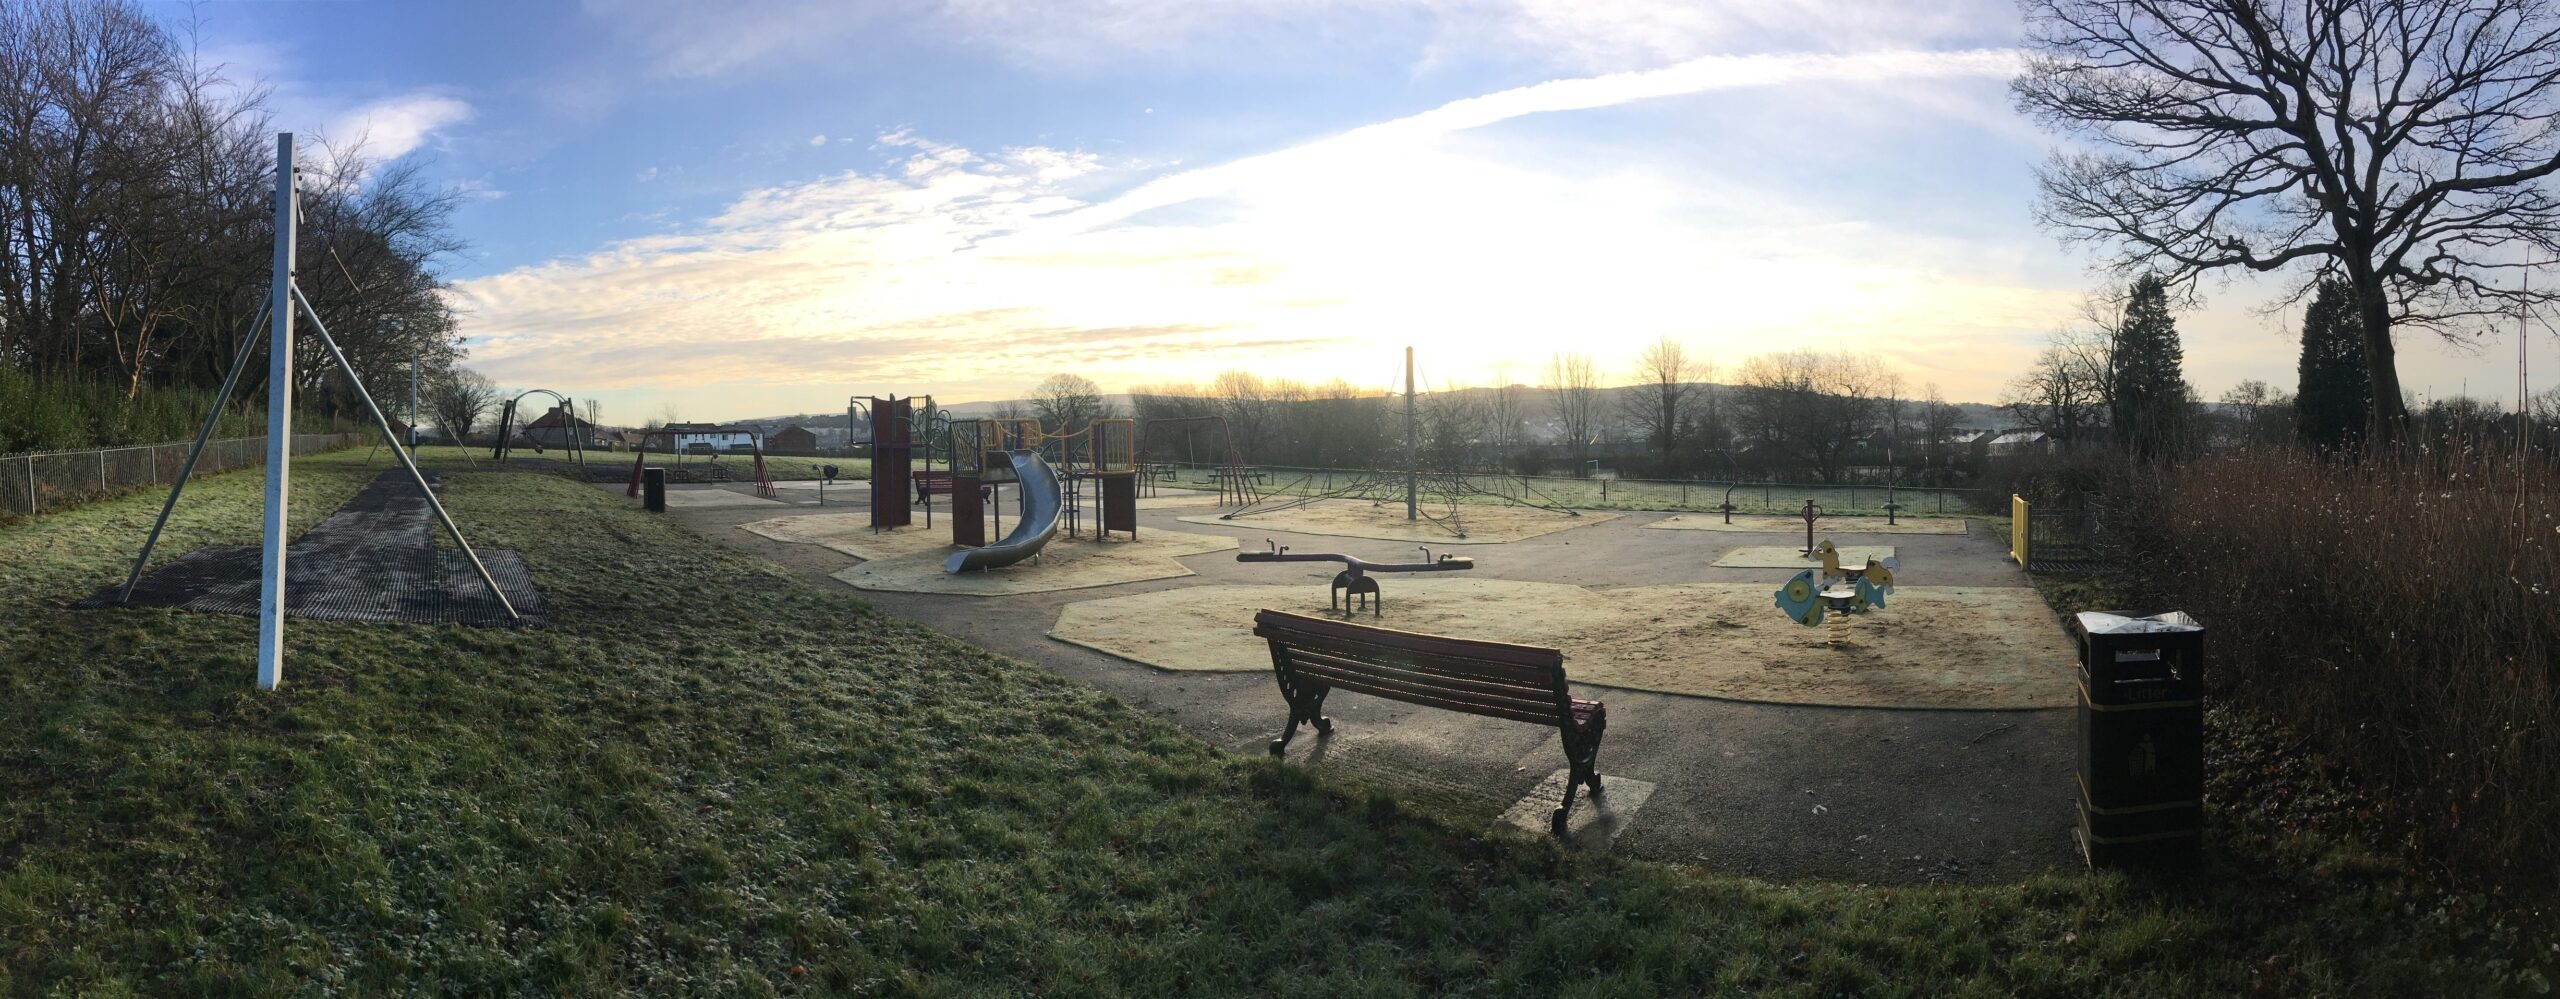 Alkincoats Playground